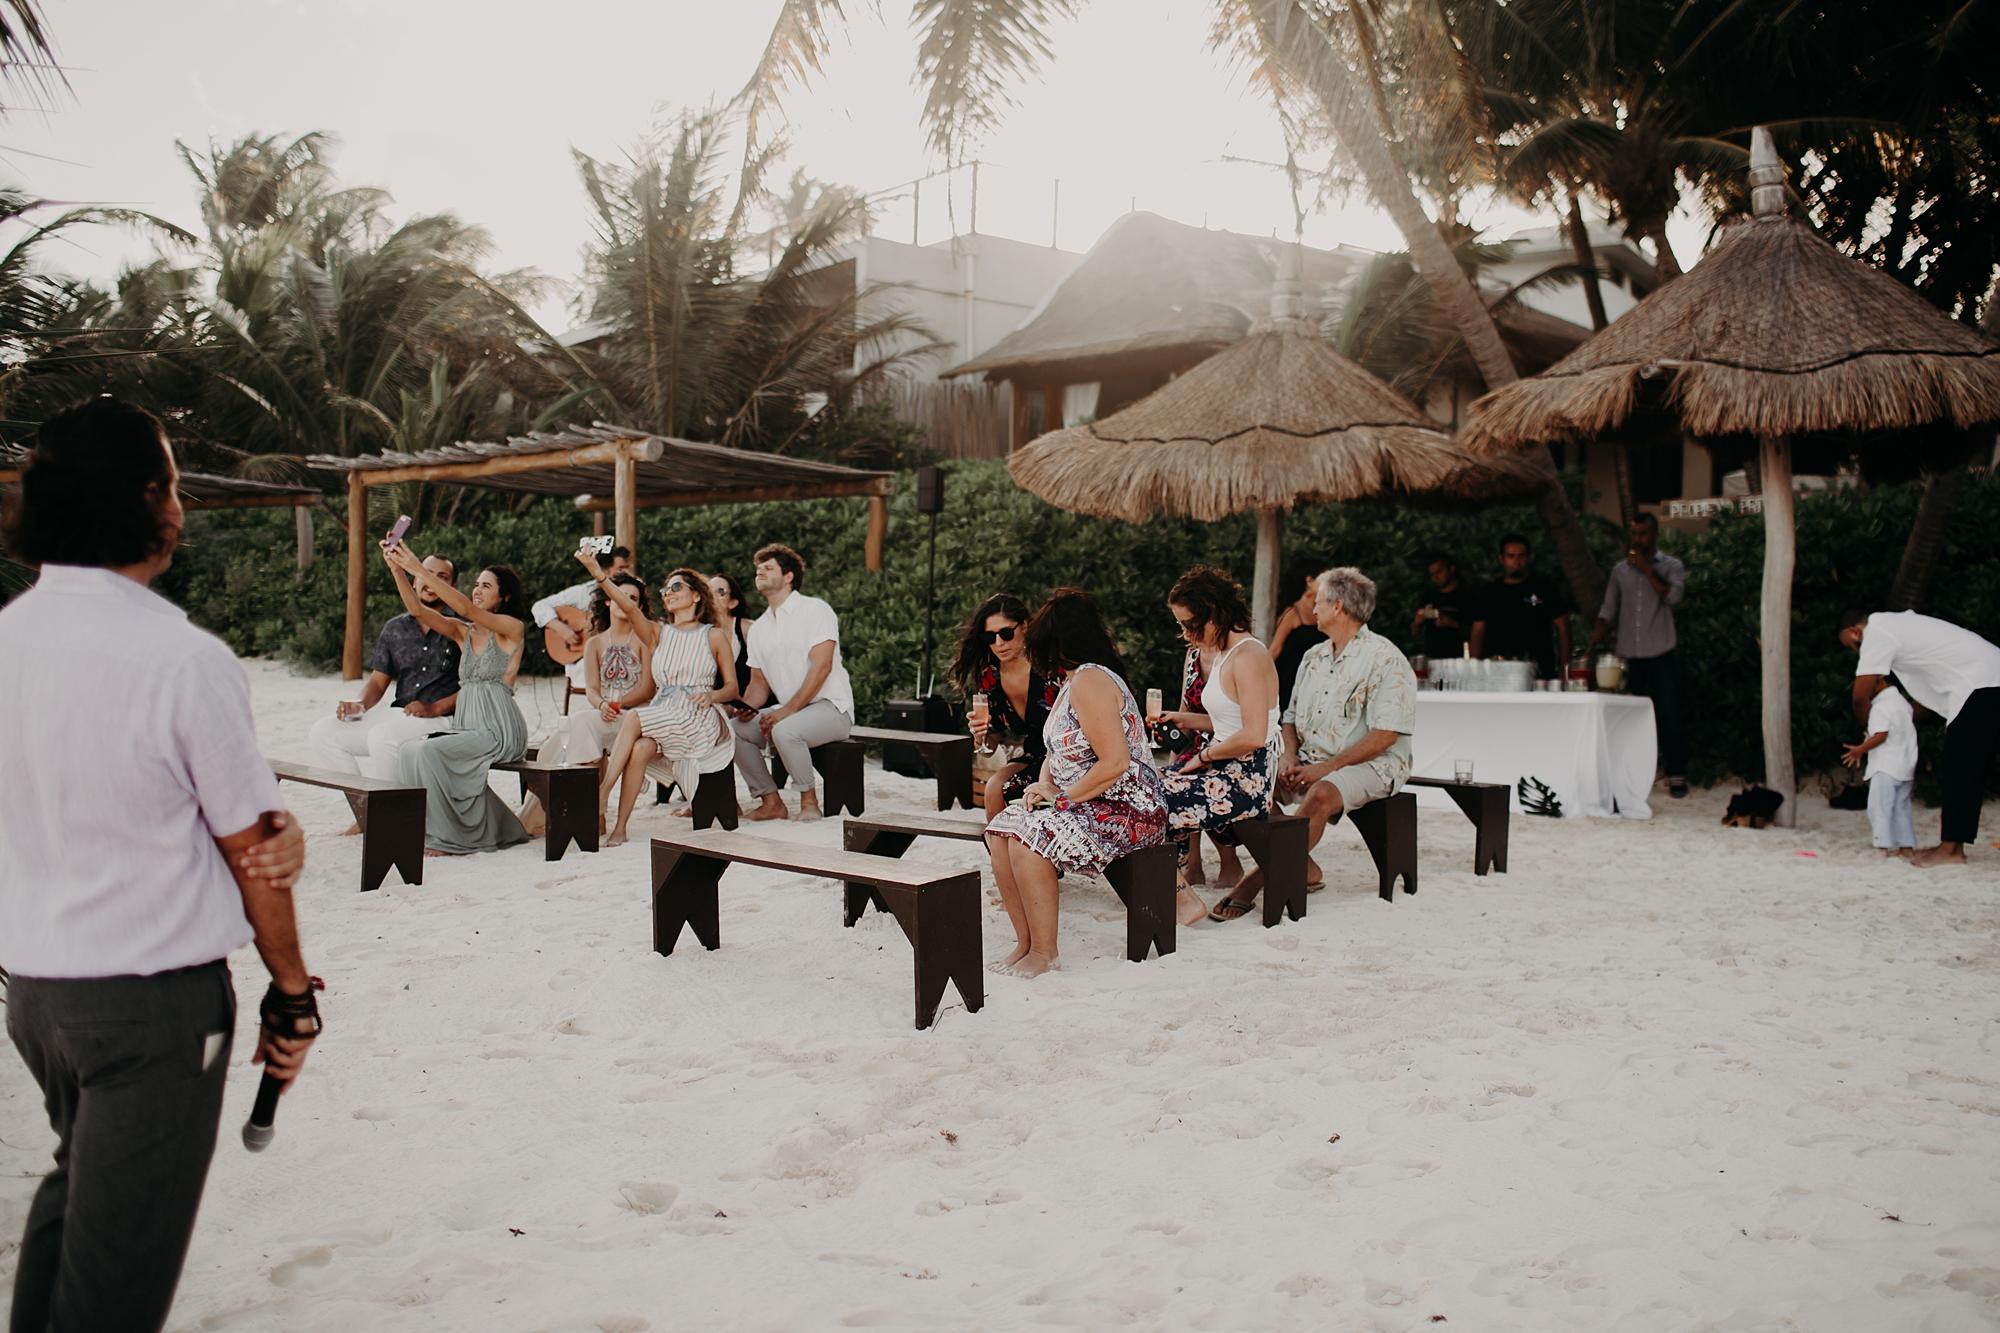 Danielle-San-Antonio-Wedding-Photographer-134_WEB.jpg